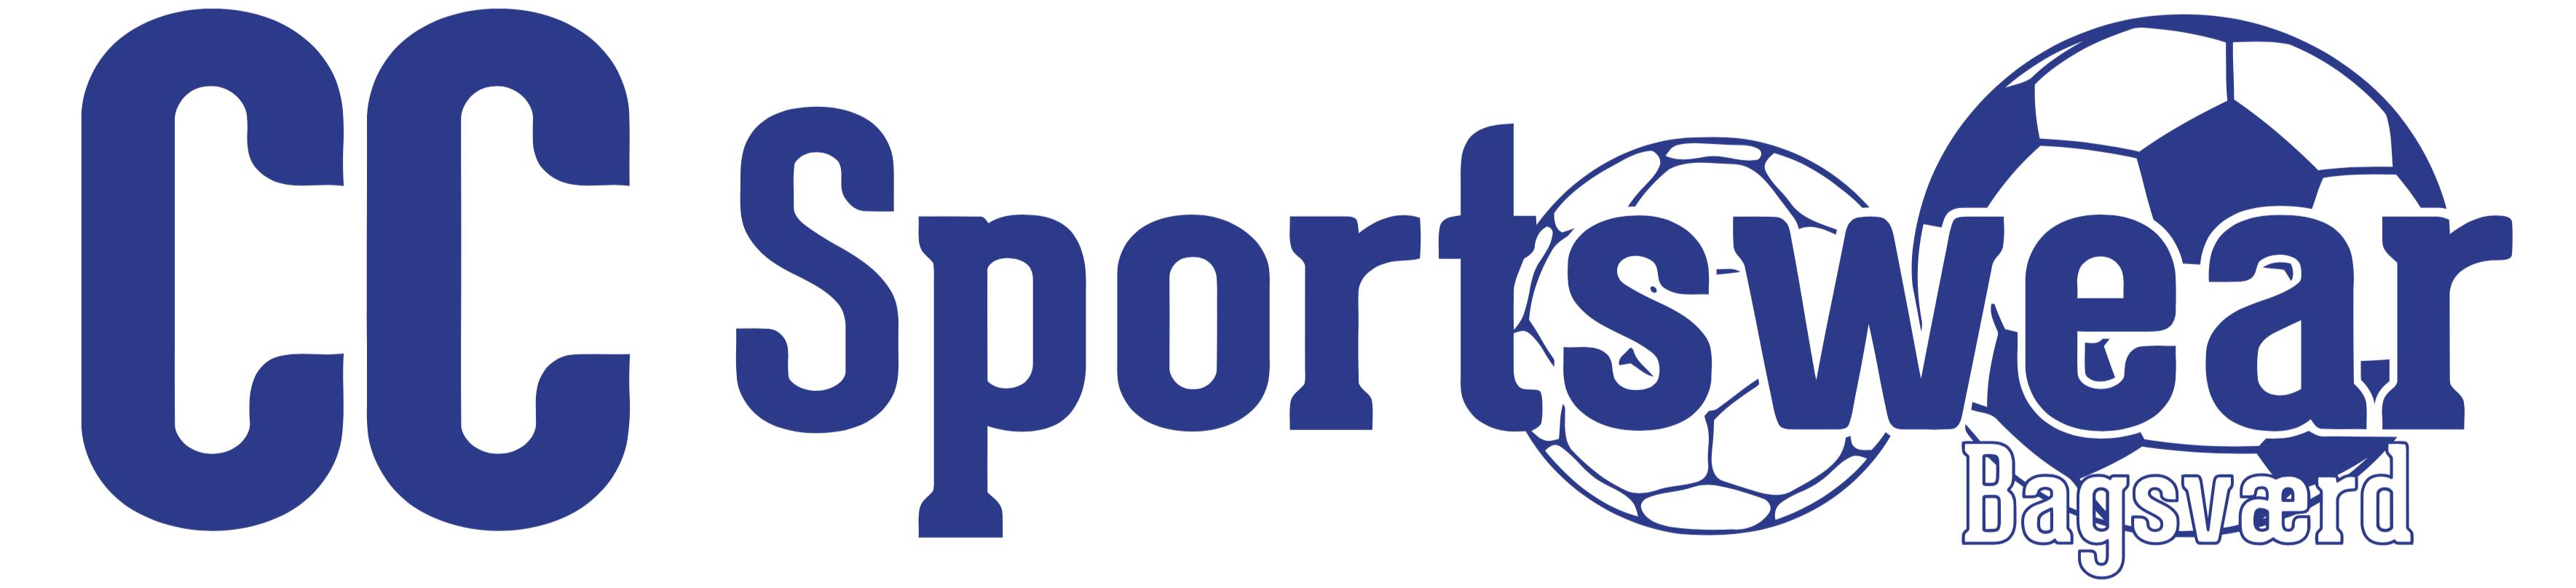 CC Sportswear sponsor for Jonathan Weywadt